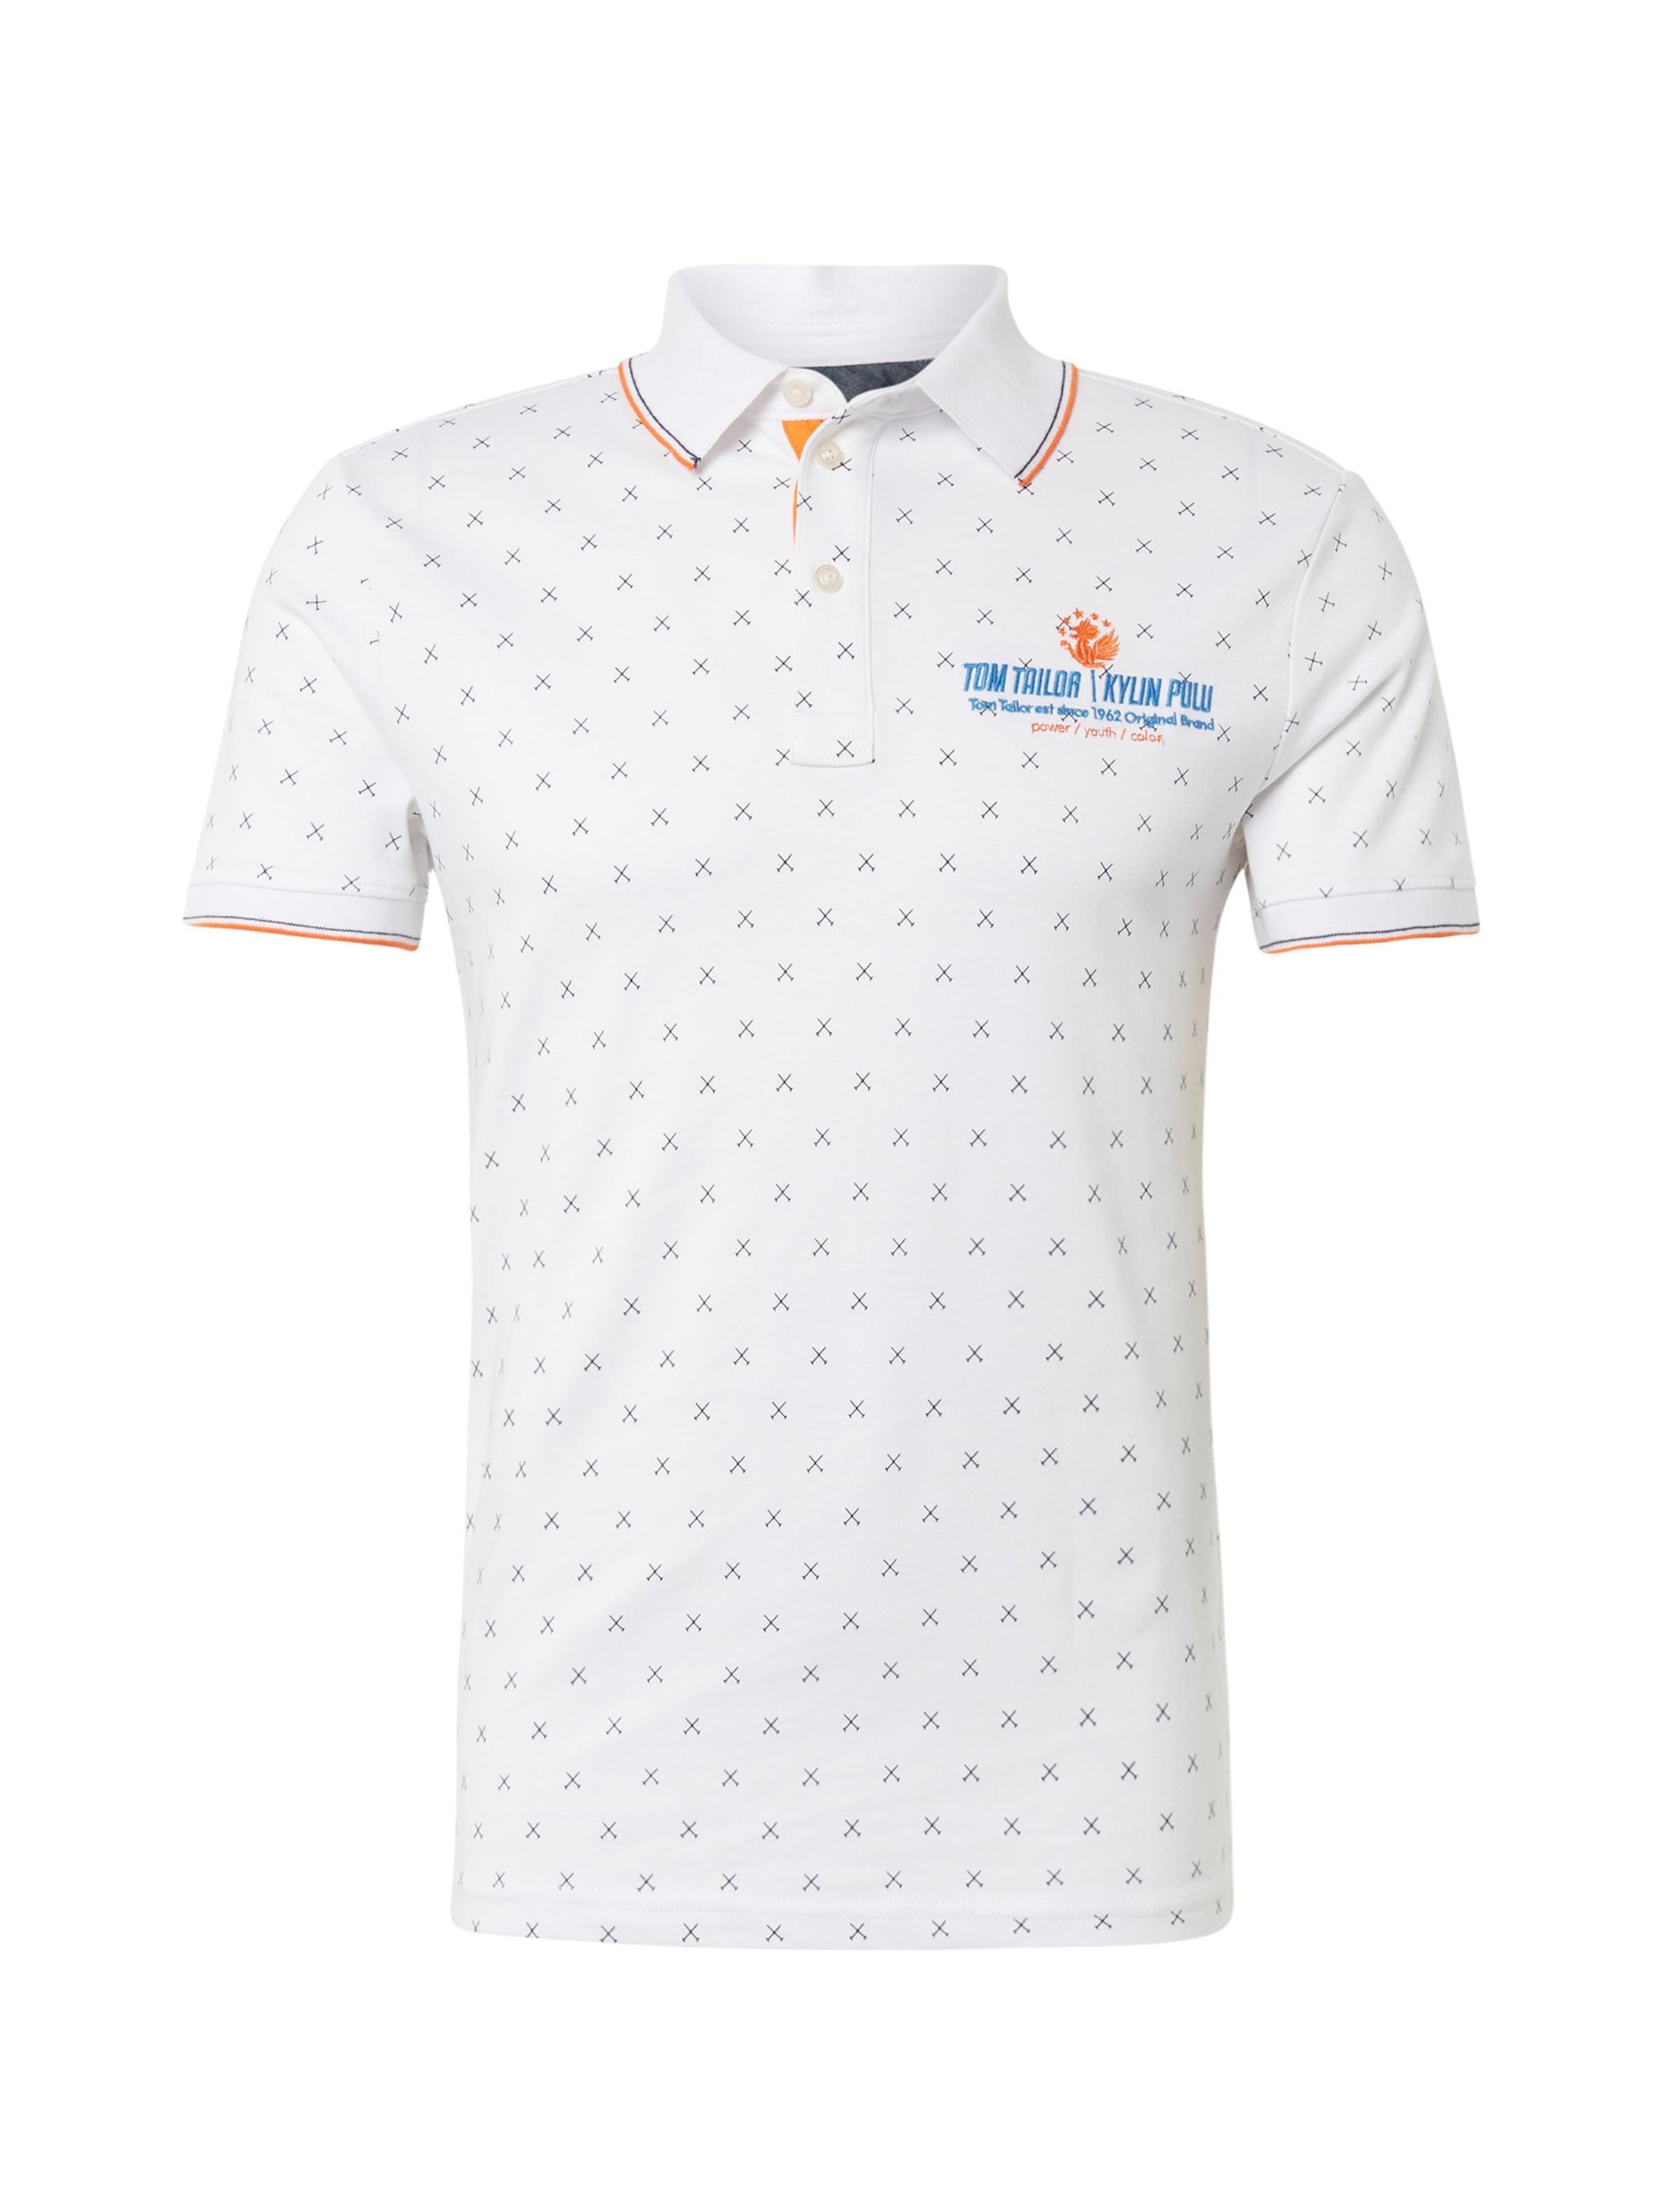 Tom Tailor Schwarz Poloshirt HimmelblauOrangemeliert Weiß In ucKJ31TlF